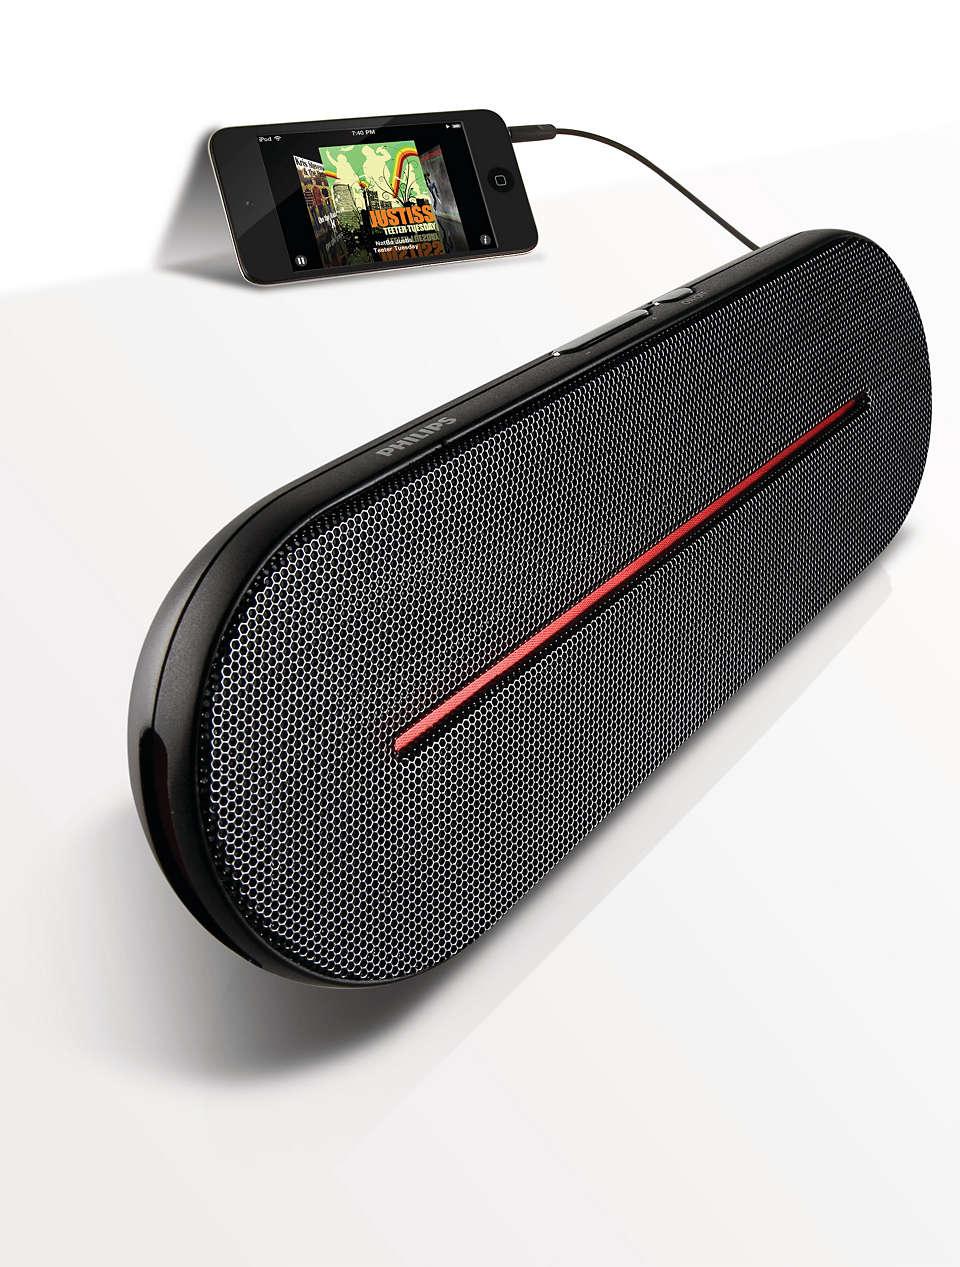 Portable, high-quality stereo sound